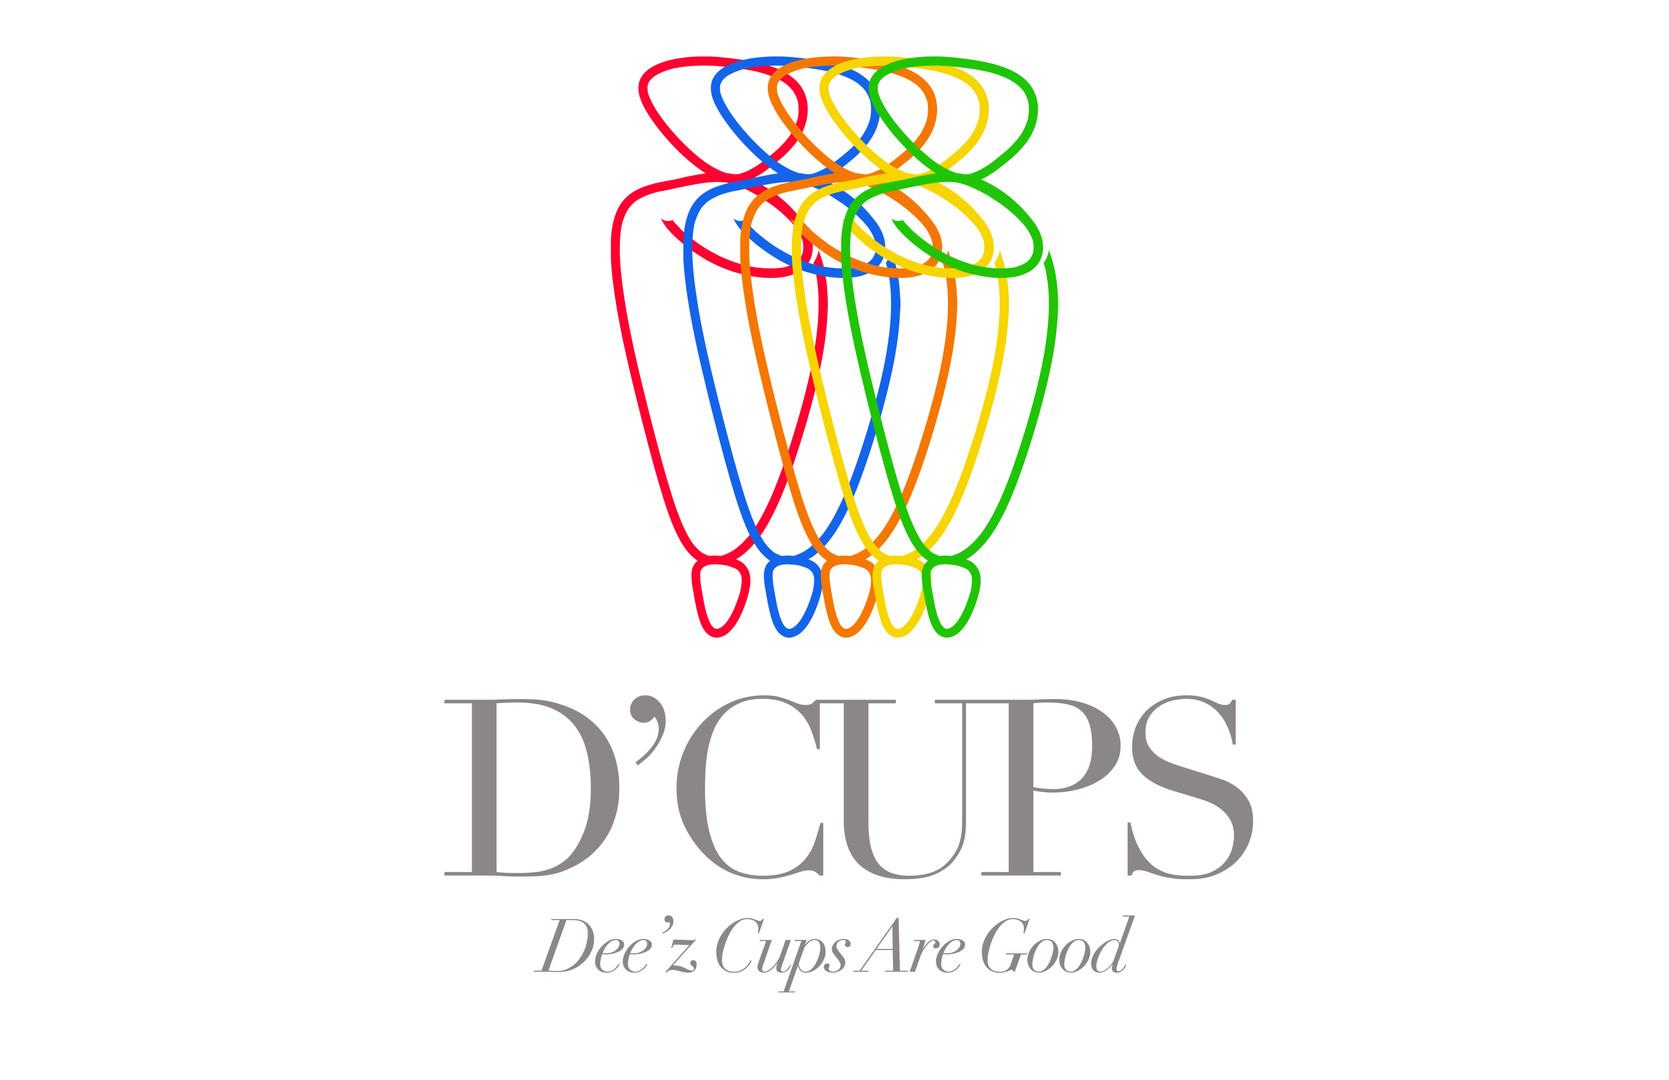 dcups.jpg